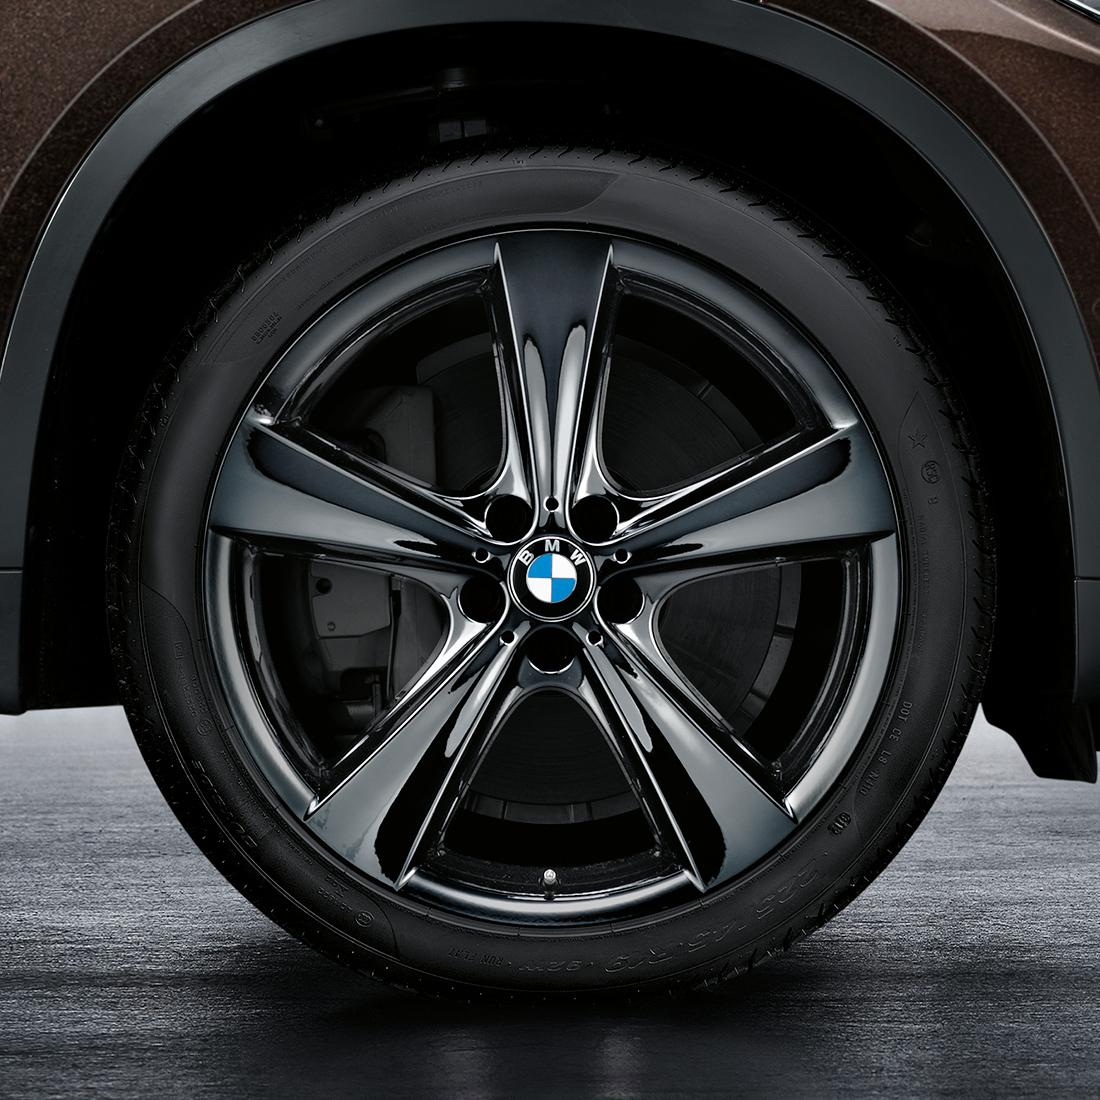 BMW Star Spoke 128 Liquid Black Complete Wheel and Tire Set